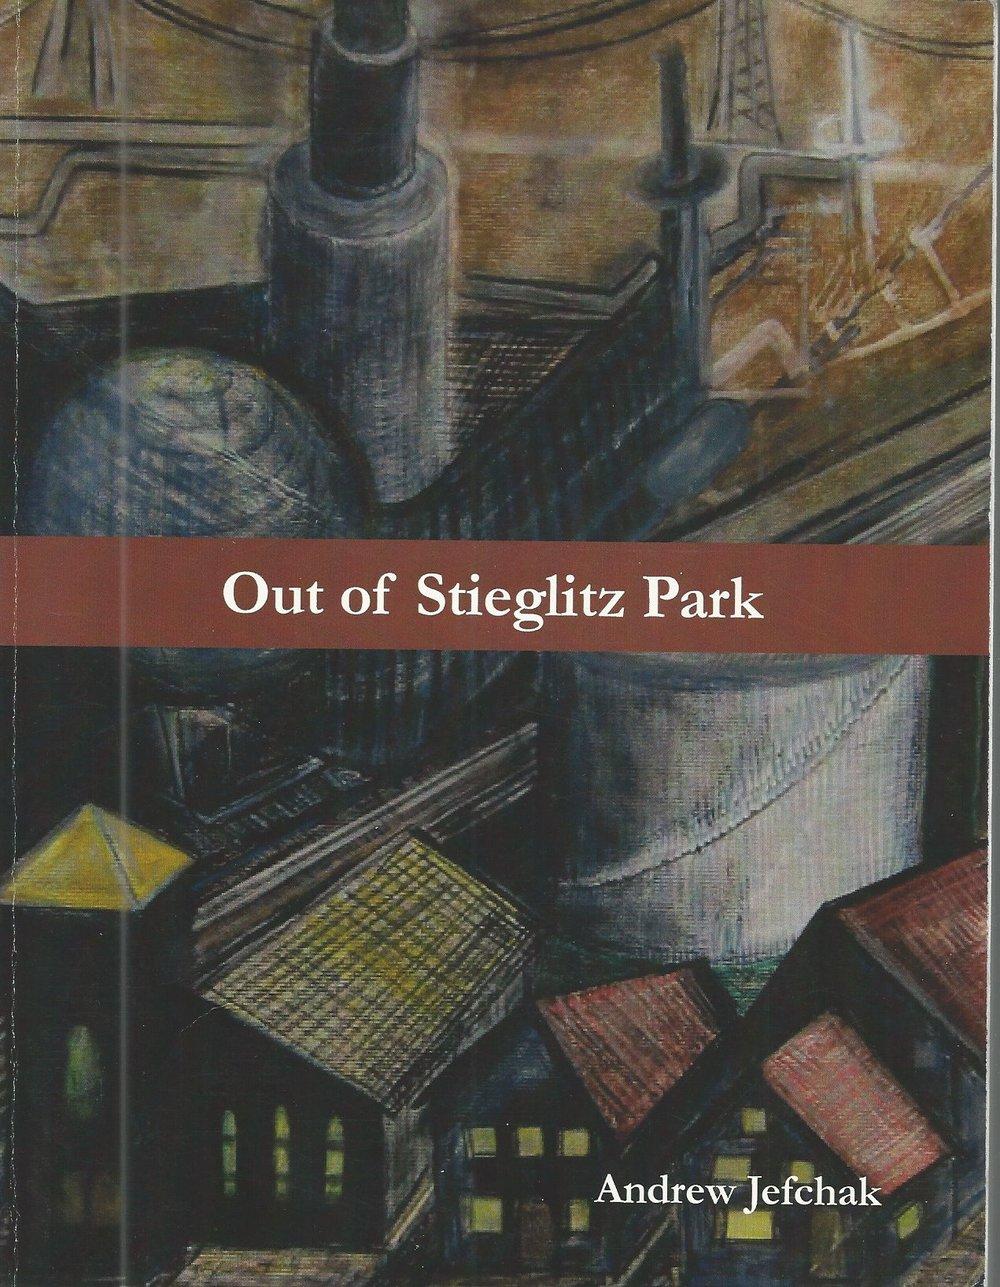 Out of Stieglitz Park by Andrew Jefchak,  2011